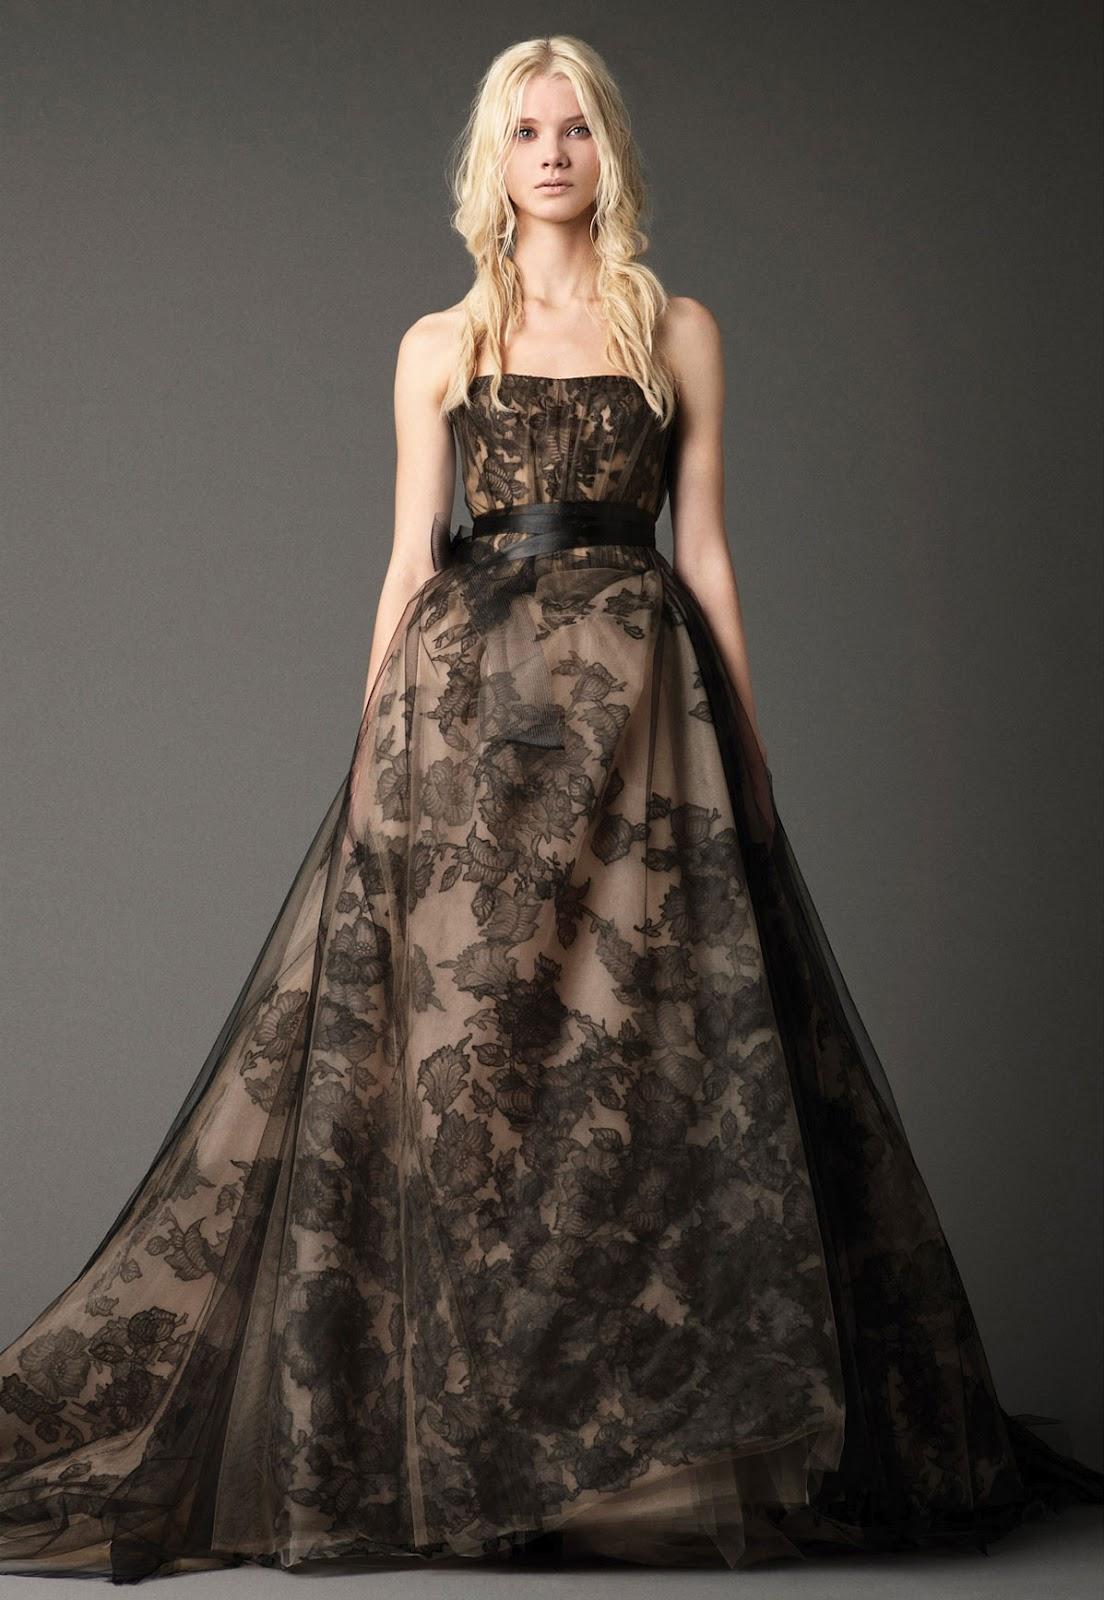 Cjnt Wedding Inspirations Vera Wang Fall 2012 Bridal Gown